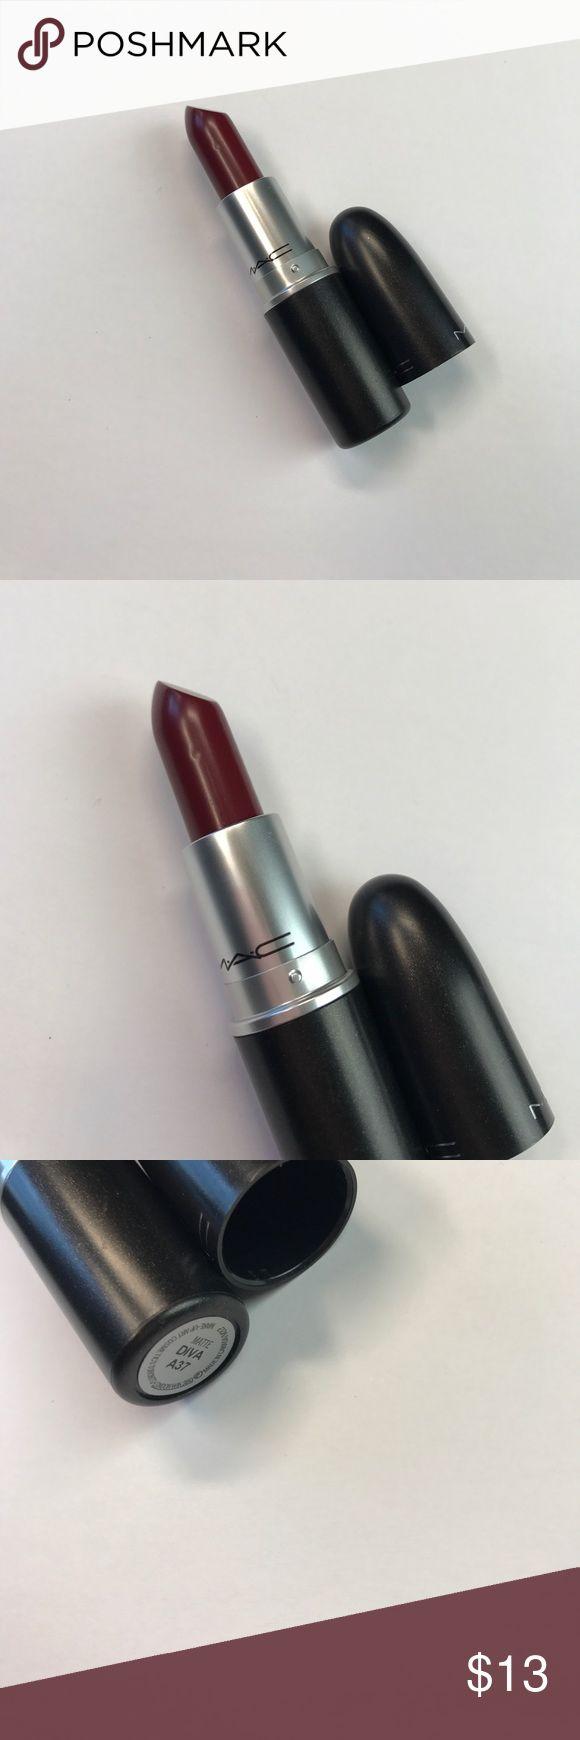 Best 25 mac diva lipstick ideas on pinterest dark - Mac diva lipstick price ...